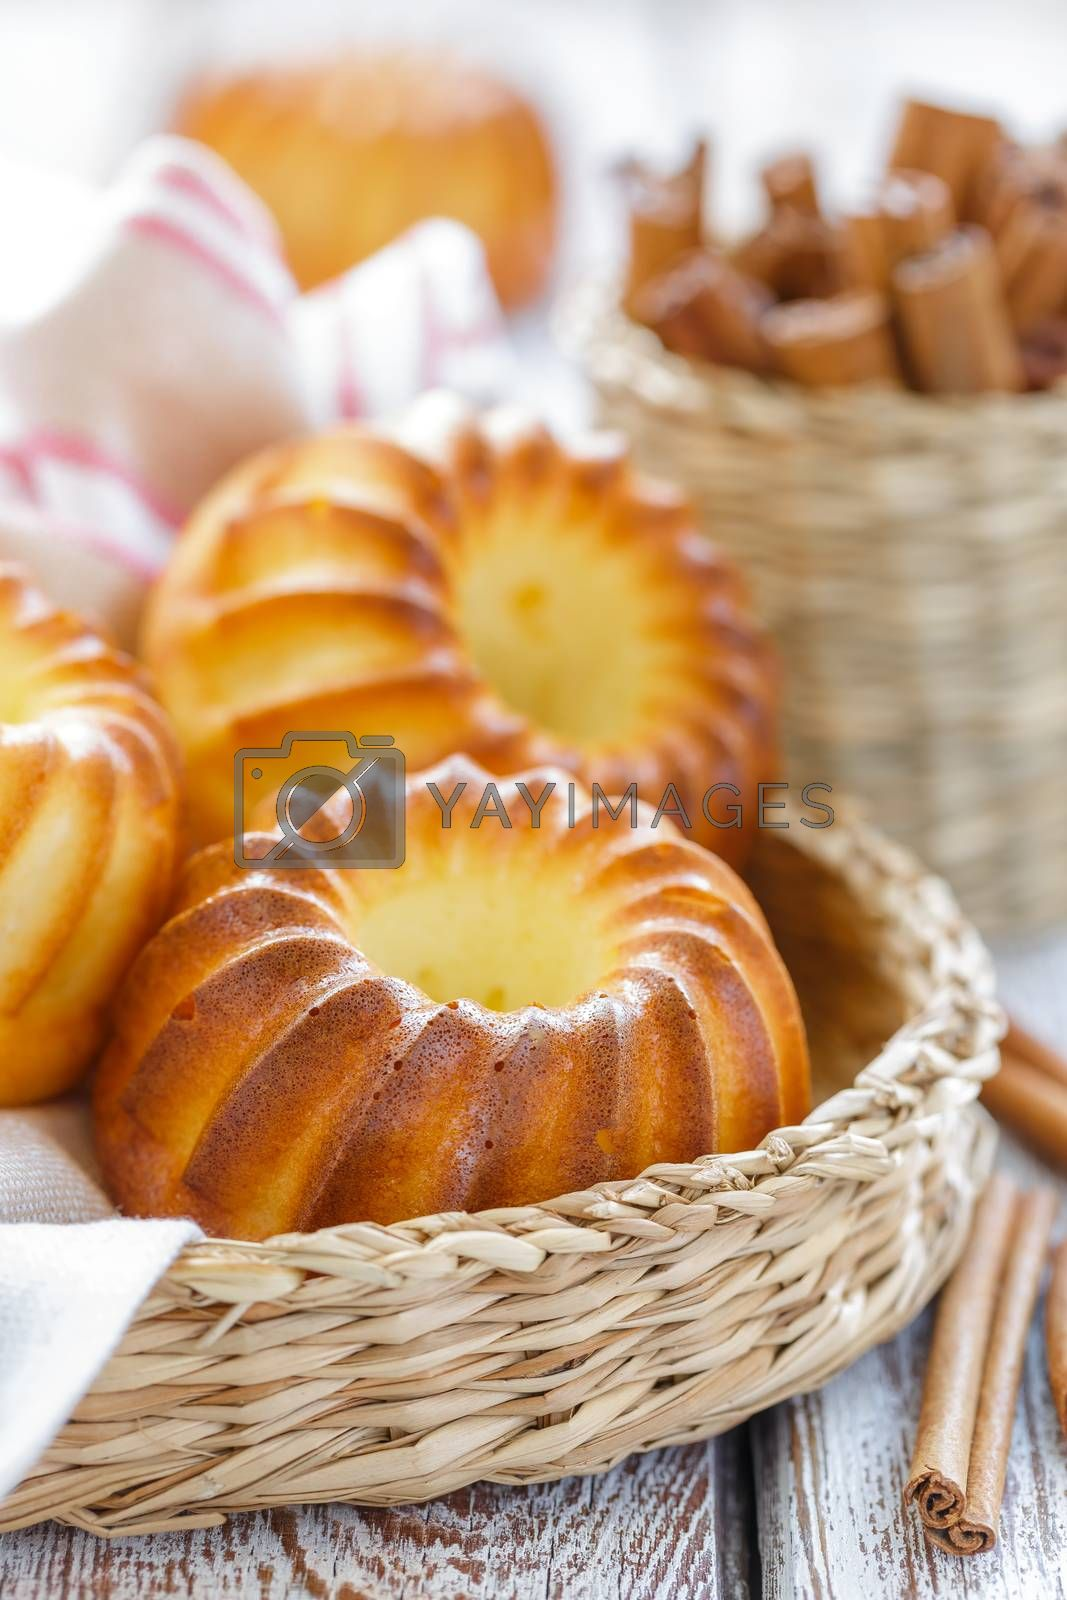 Royalty free image of Muffins by yelenayemchuk